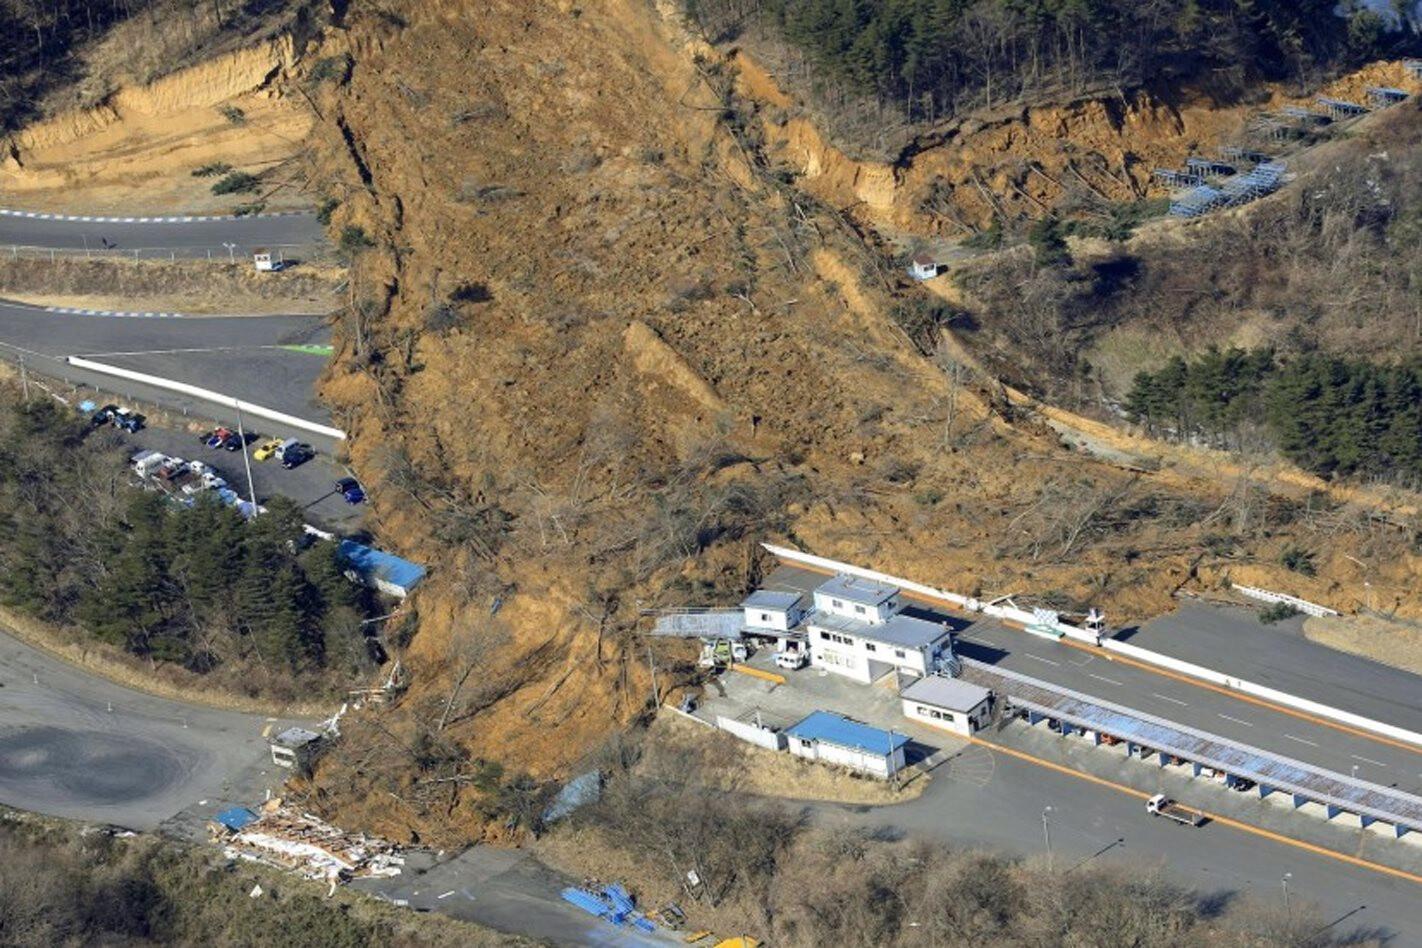 Famed Ebisu Circuit suffers heavy damage amidst 7.3 magnitude earthquake